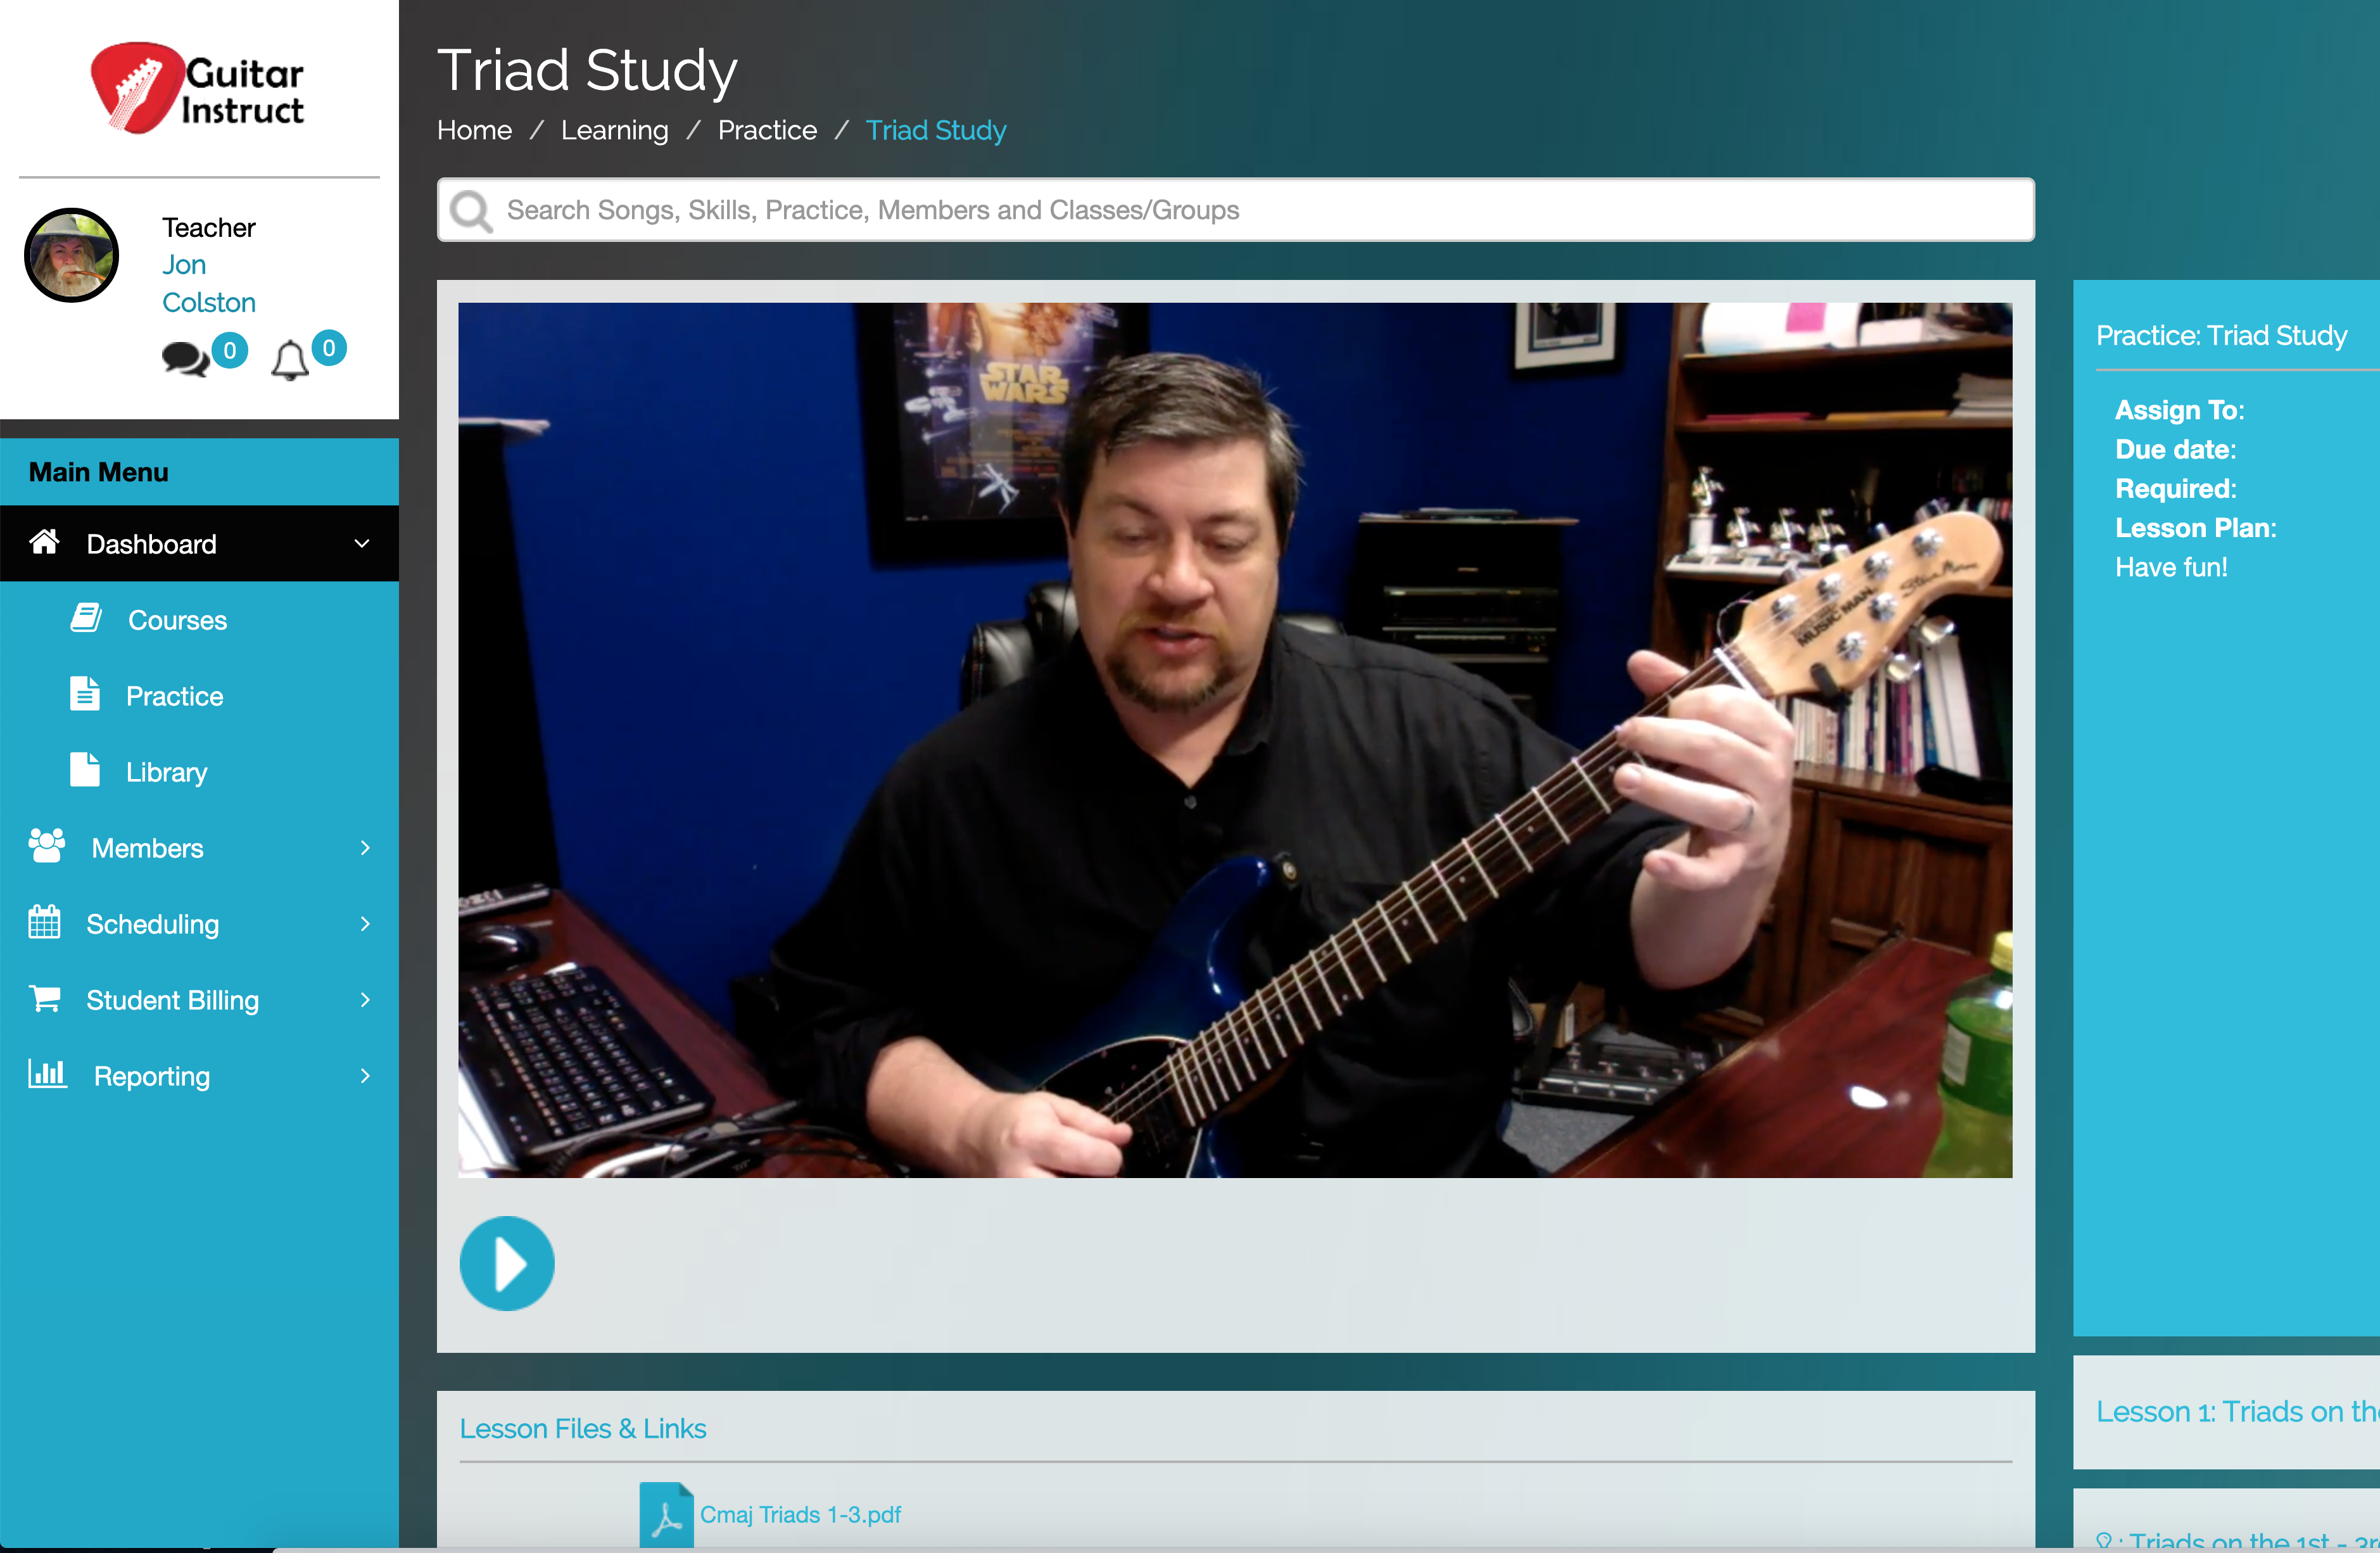 GuitarInstruct.com brand image